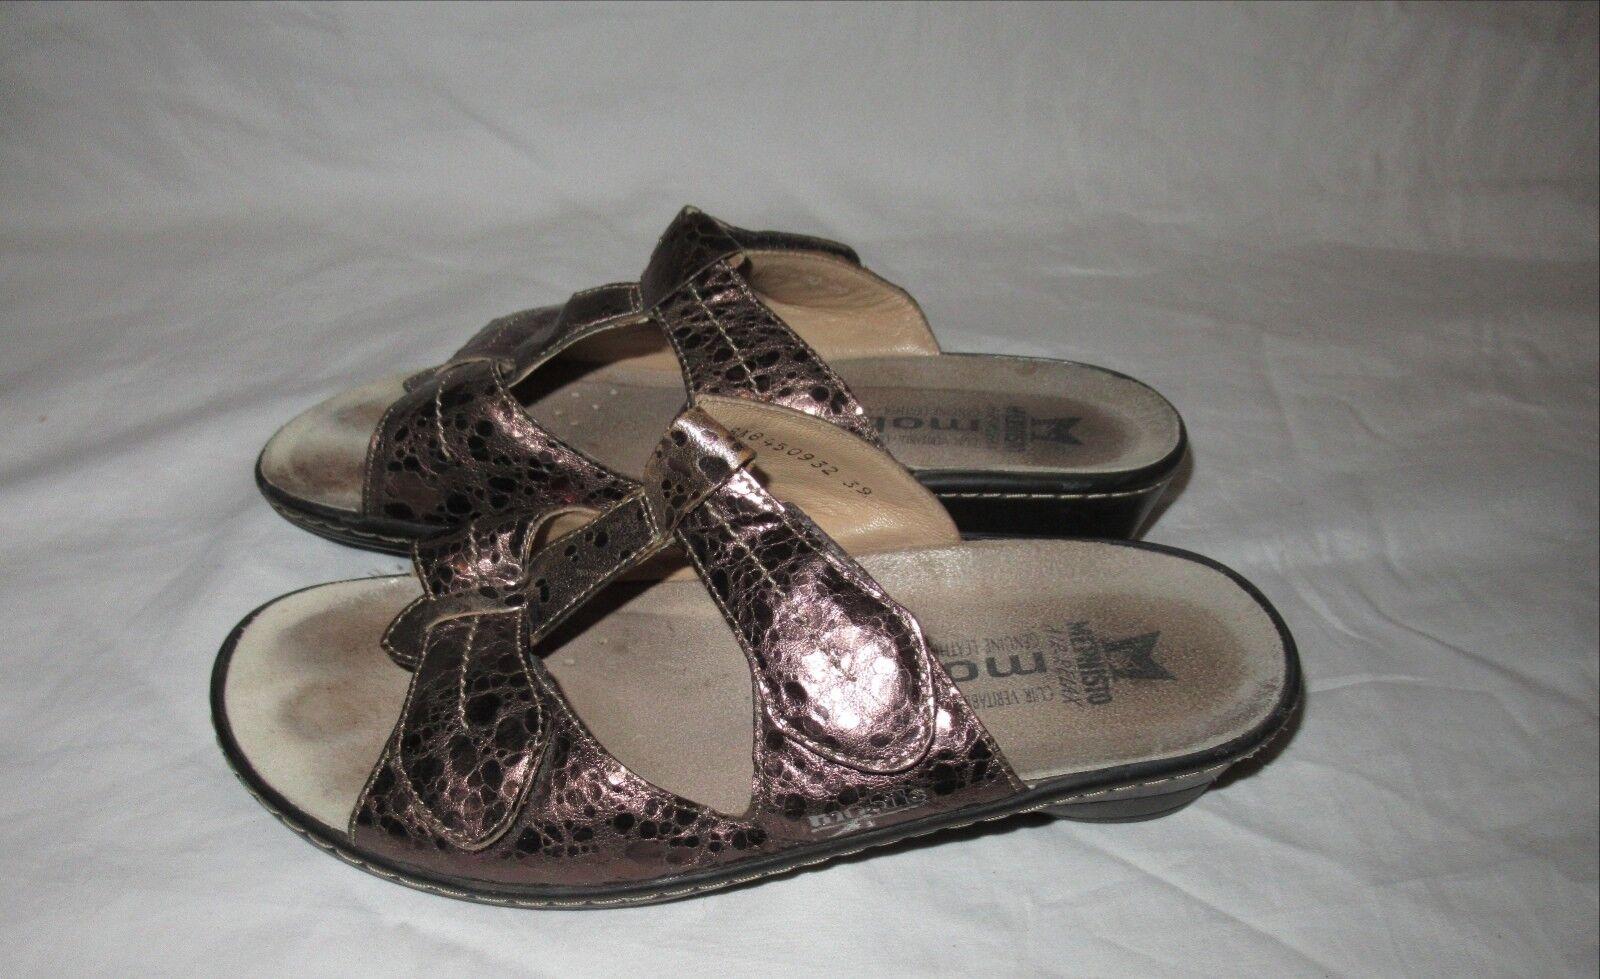 MEPHISTO MOBILS EU 39 39 39 nos 9 Charol T Correa OT Sandalias Gancho Bucle limpio  compras de moda online